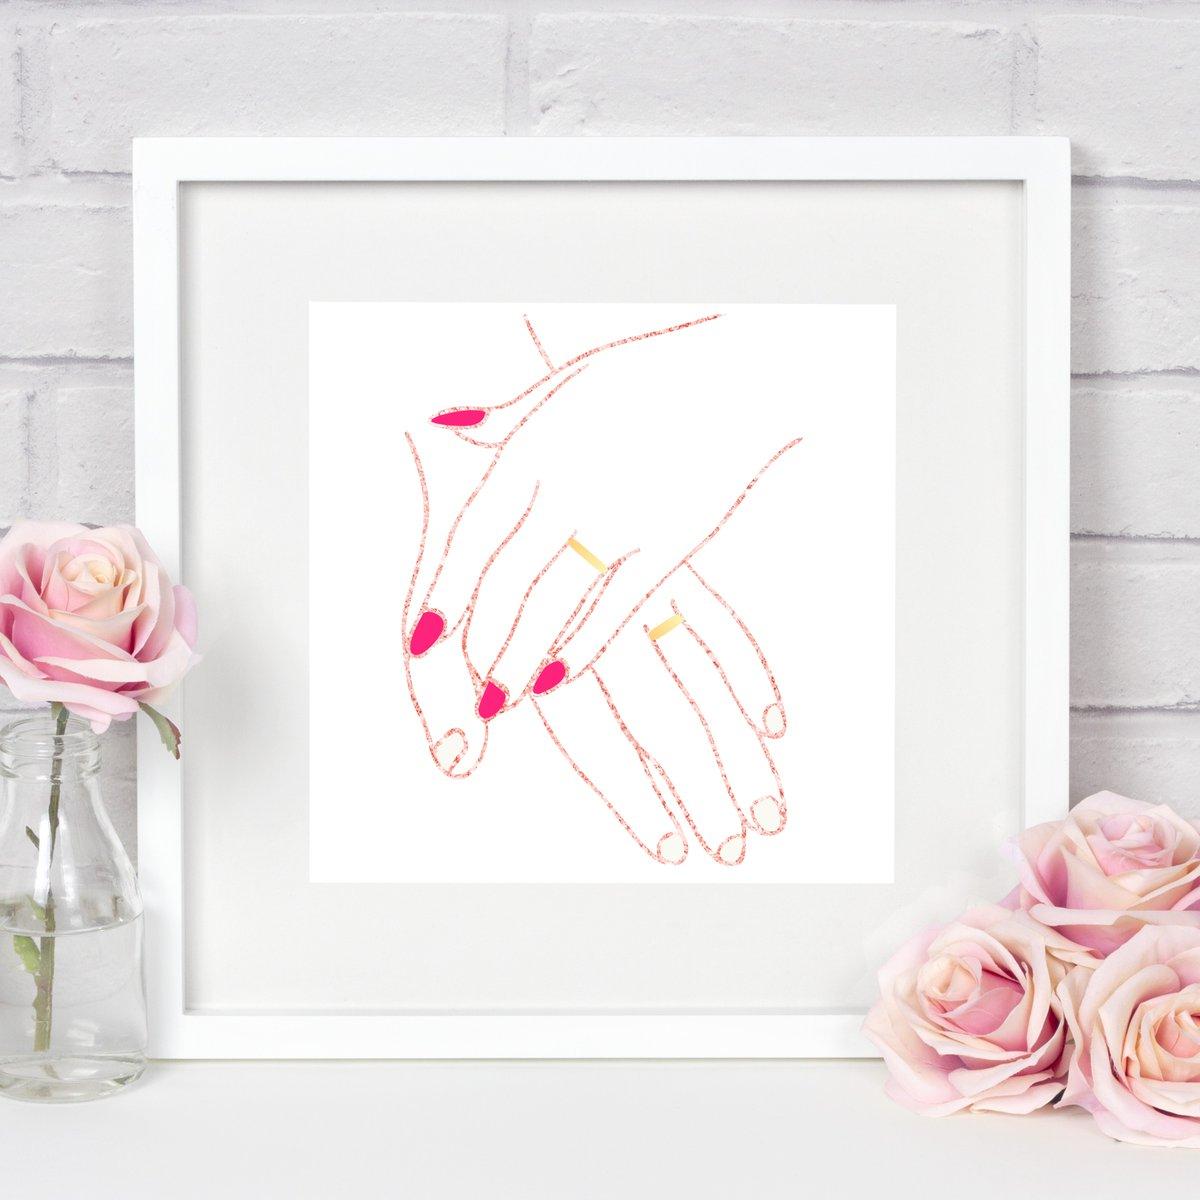 Newlywed *digital download* by FunkyPandaPrints on Etsy #newlyweds #firstanniversary #love #funkypandaprints #design #art #treatyourself #whynot #cheapandcheerful #giftideas #lastminutegift #diy #homedecor #digitalprints #printablepic.twitter.com/YqKXXodqzC